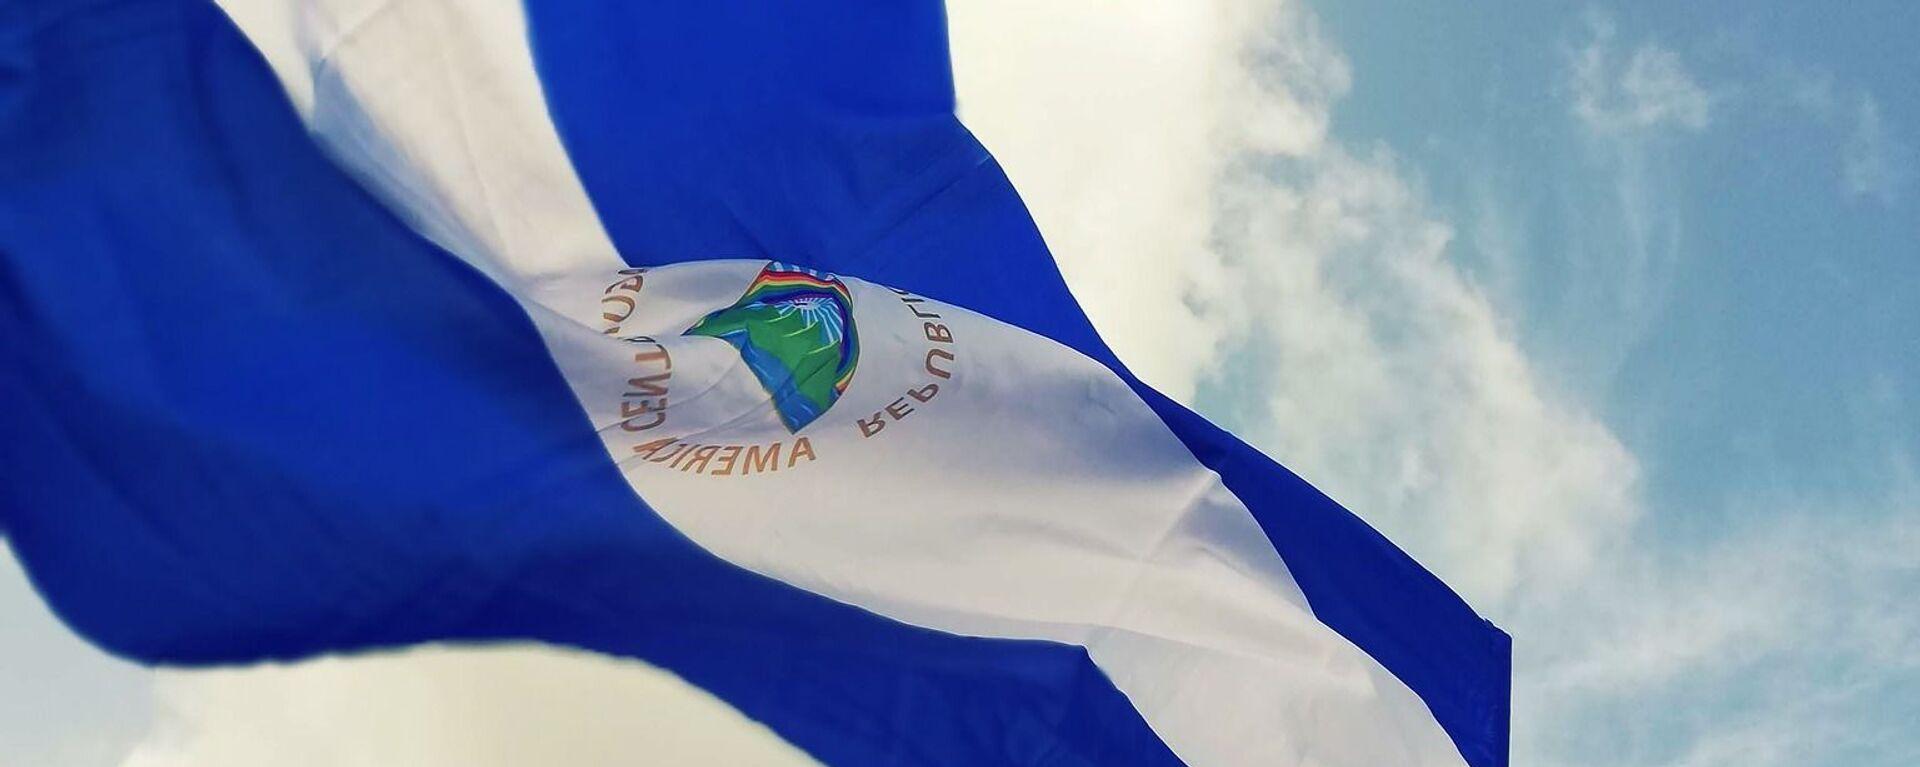 Bandera de Nicaragua - Sputnik Mundo, 1920, 09.04.2021